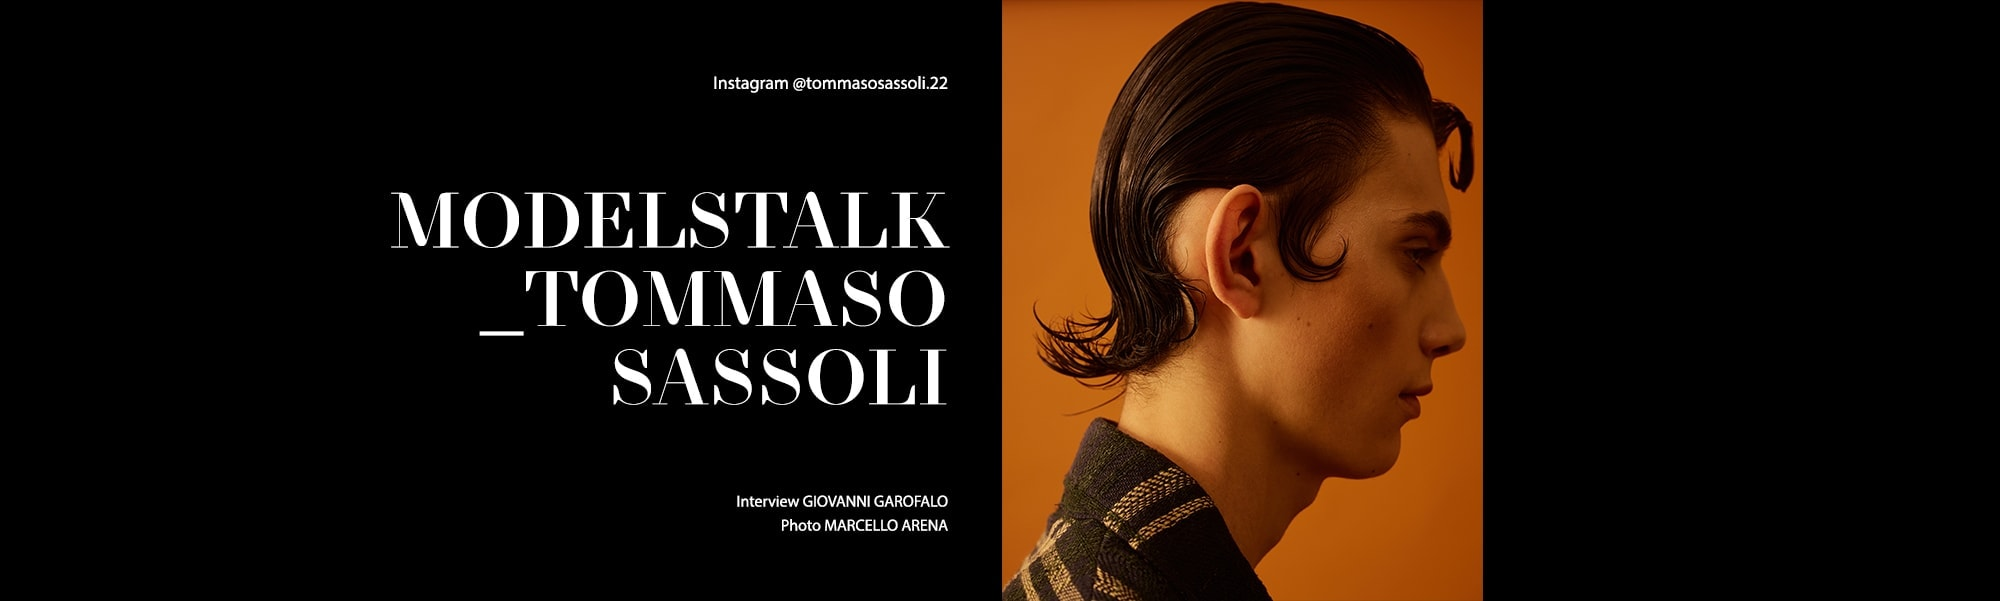 tommaso-sassoli-banner-landing-thegreatestmagazine-talking-heads